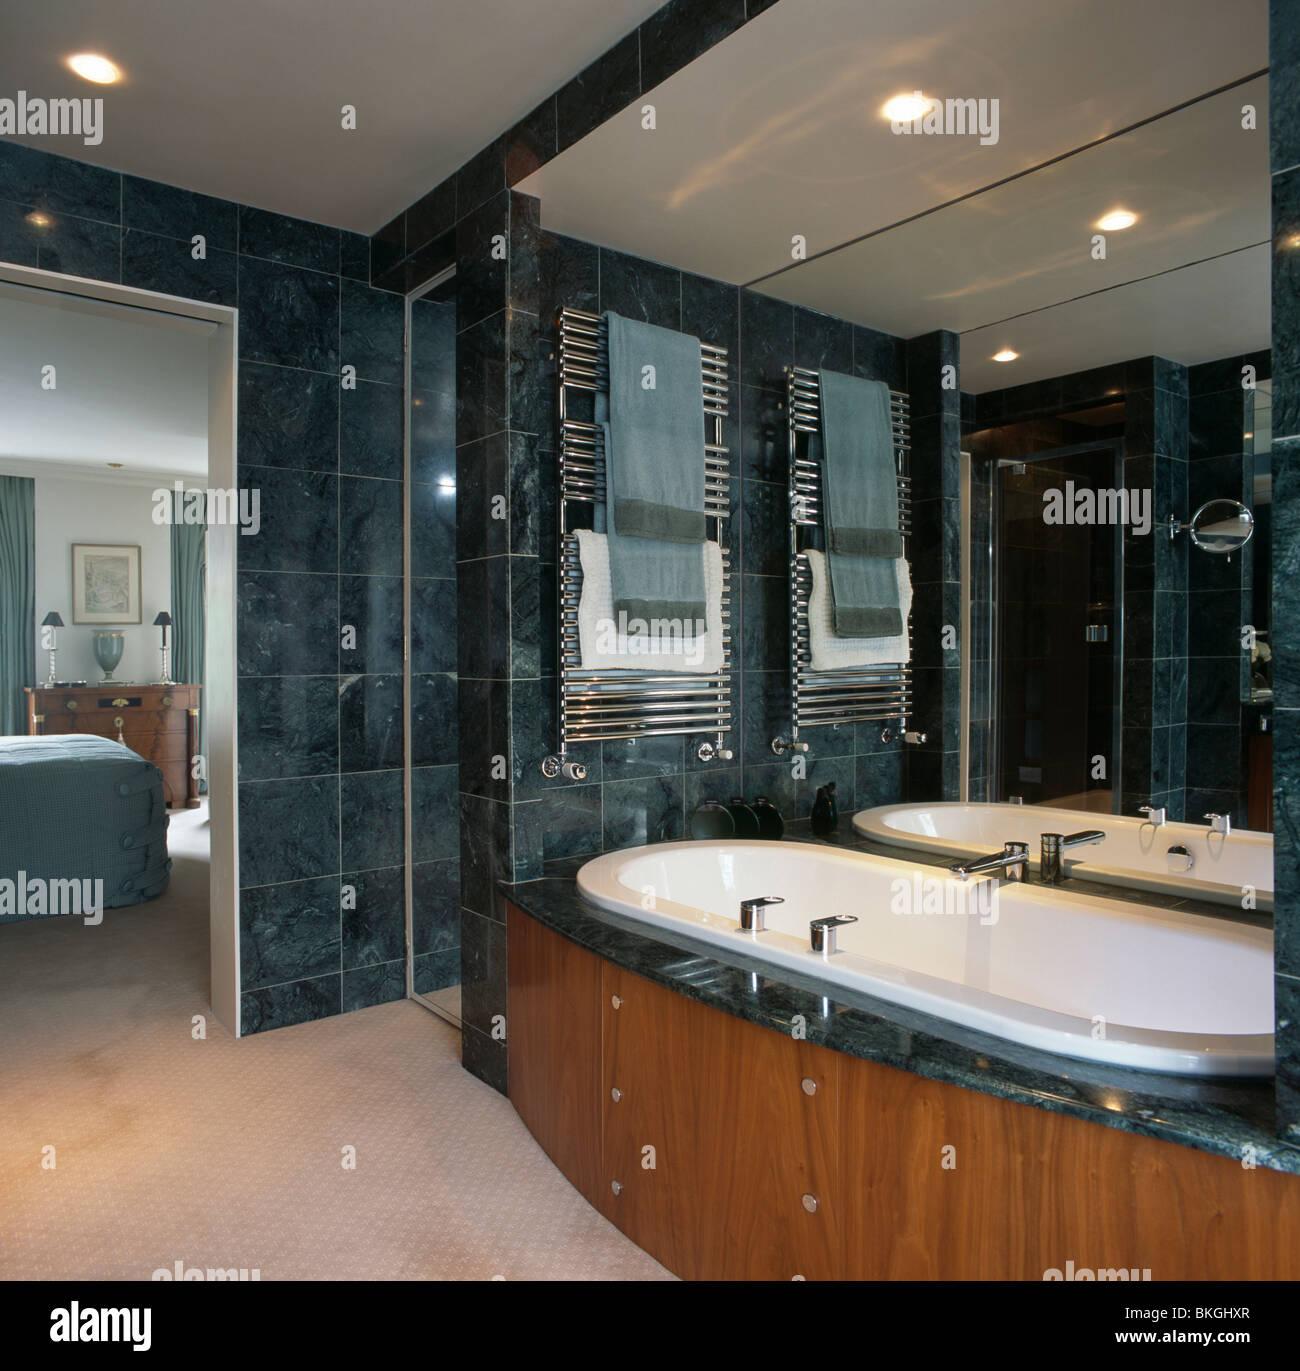 Towel rails for bathroom - Stock Photo Towels On Heated Towel Rails Above Bath In Modern Marble Tiled En Suite Bathroom